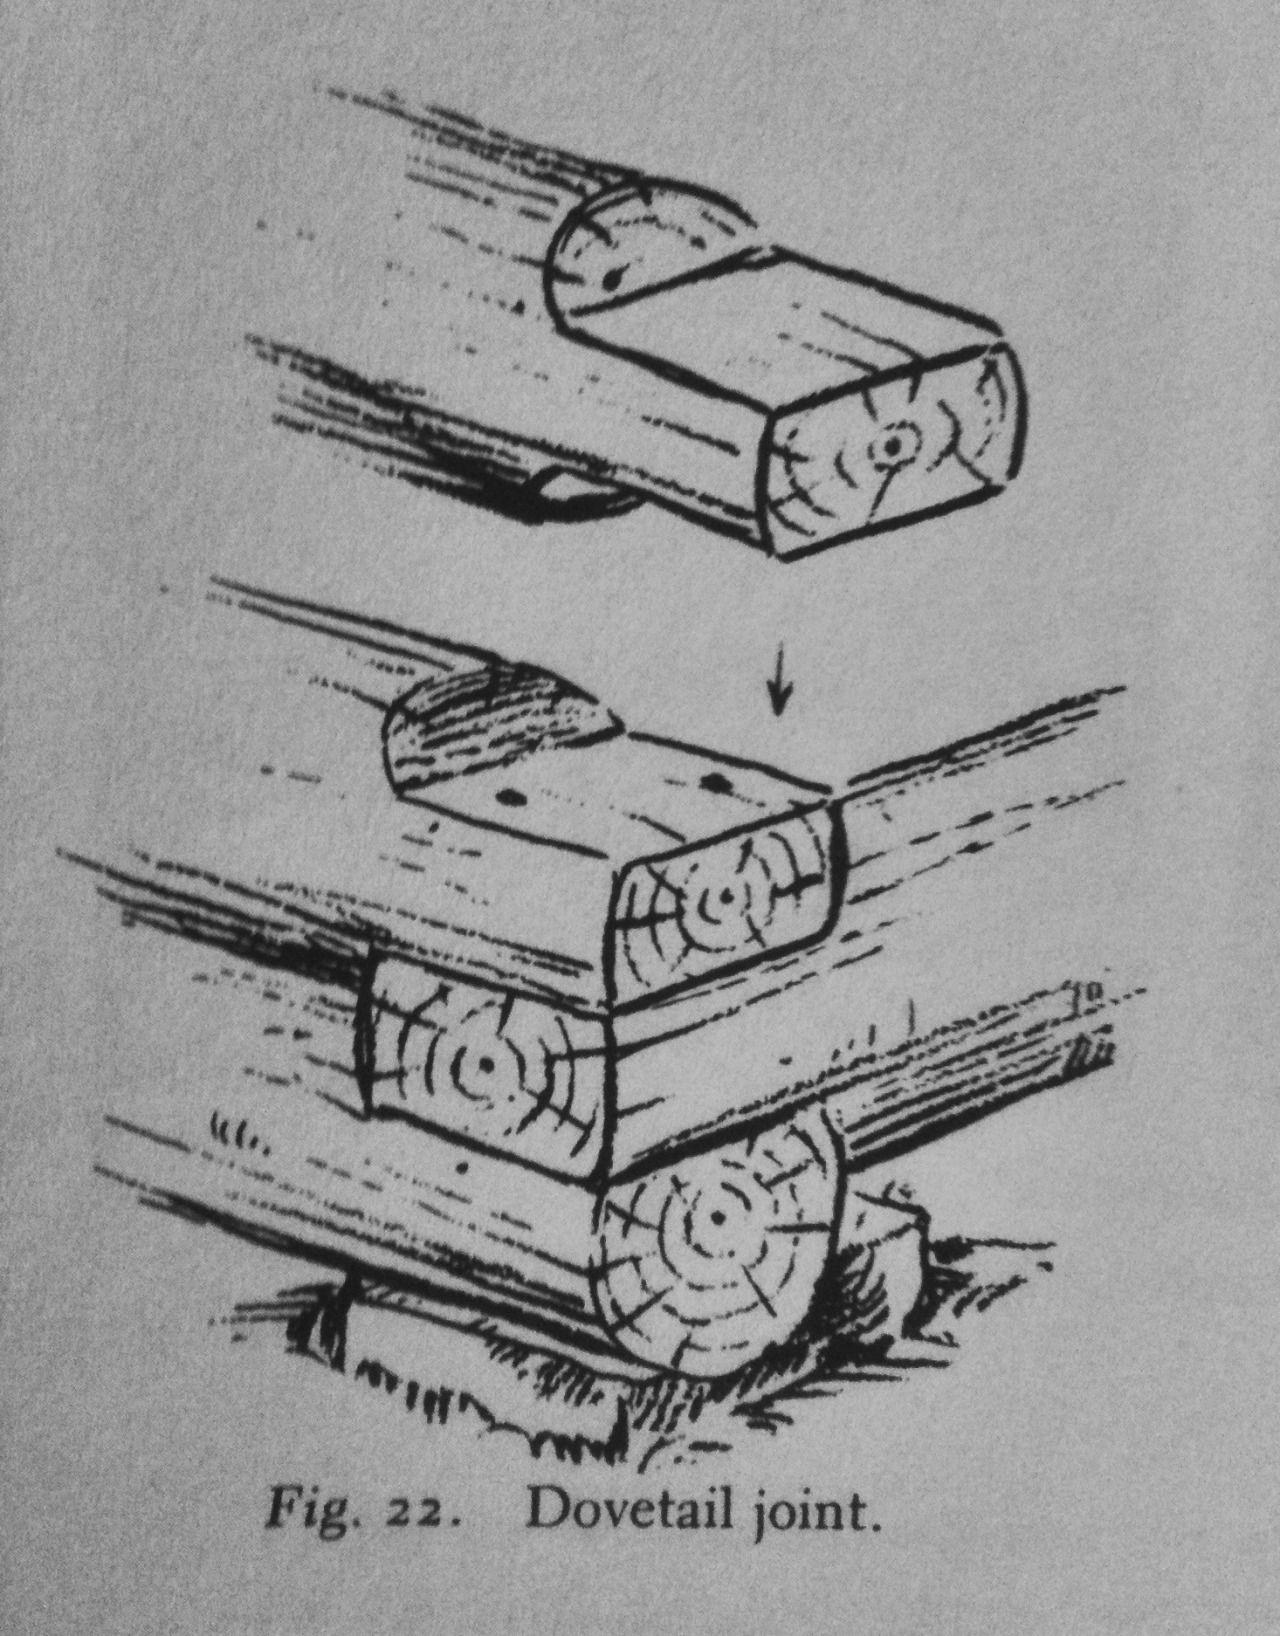 "justenoughisplenty "" Dovetail joint. From W. Ben Hunt's"